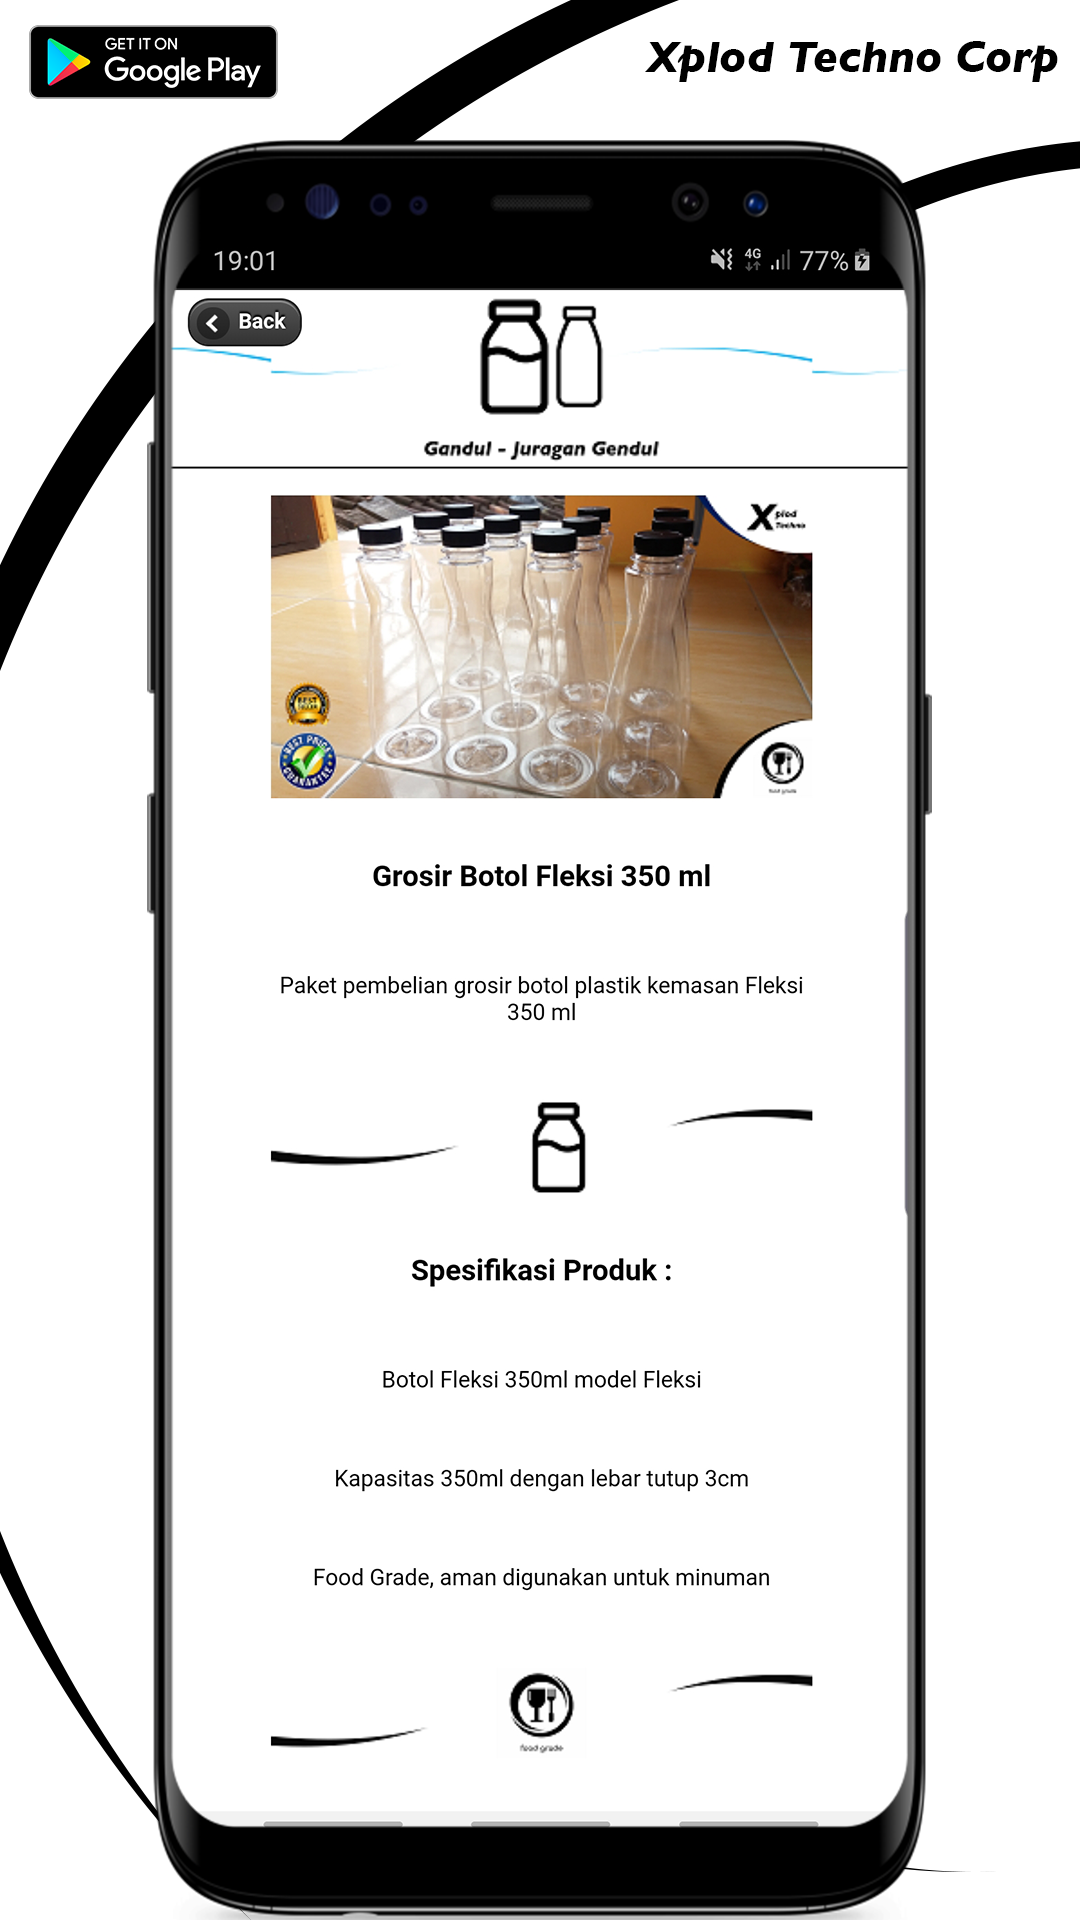 Download Gratis Aplikasi Smartphone Gandul Juragan Gendul Dari Developer Aplikasi Smartphone Solo Botol Plastik Aplikasi Google Play